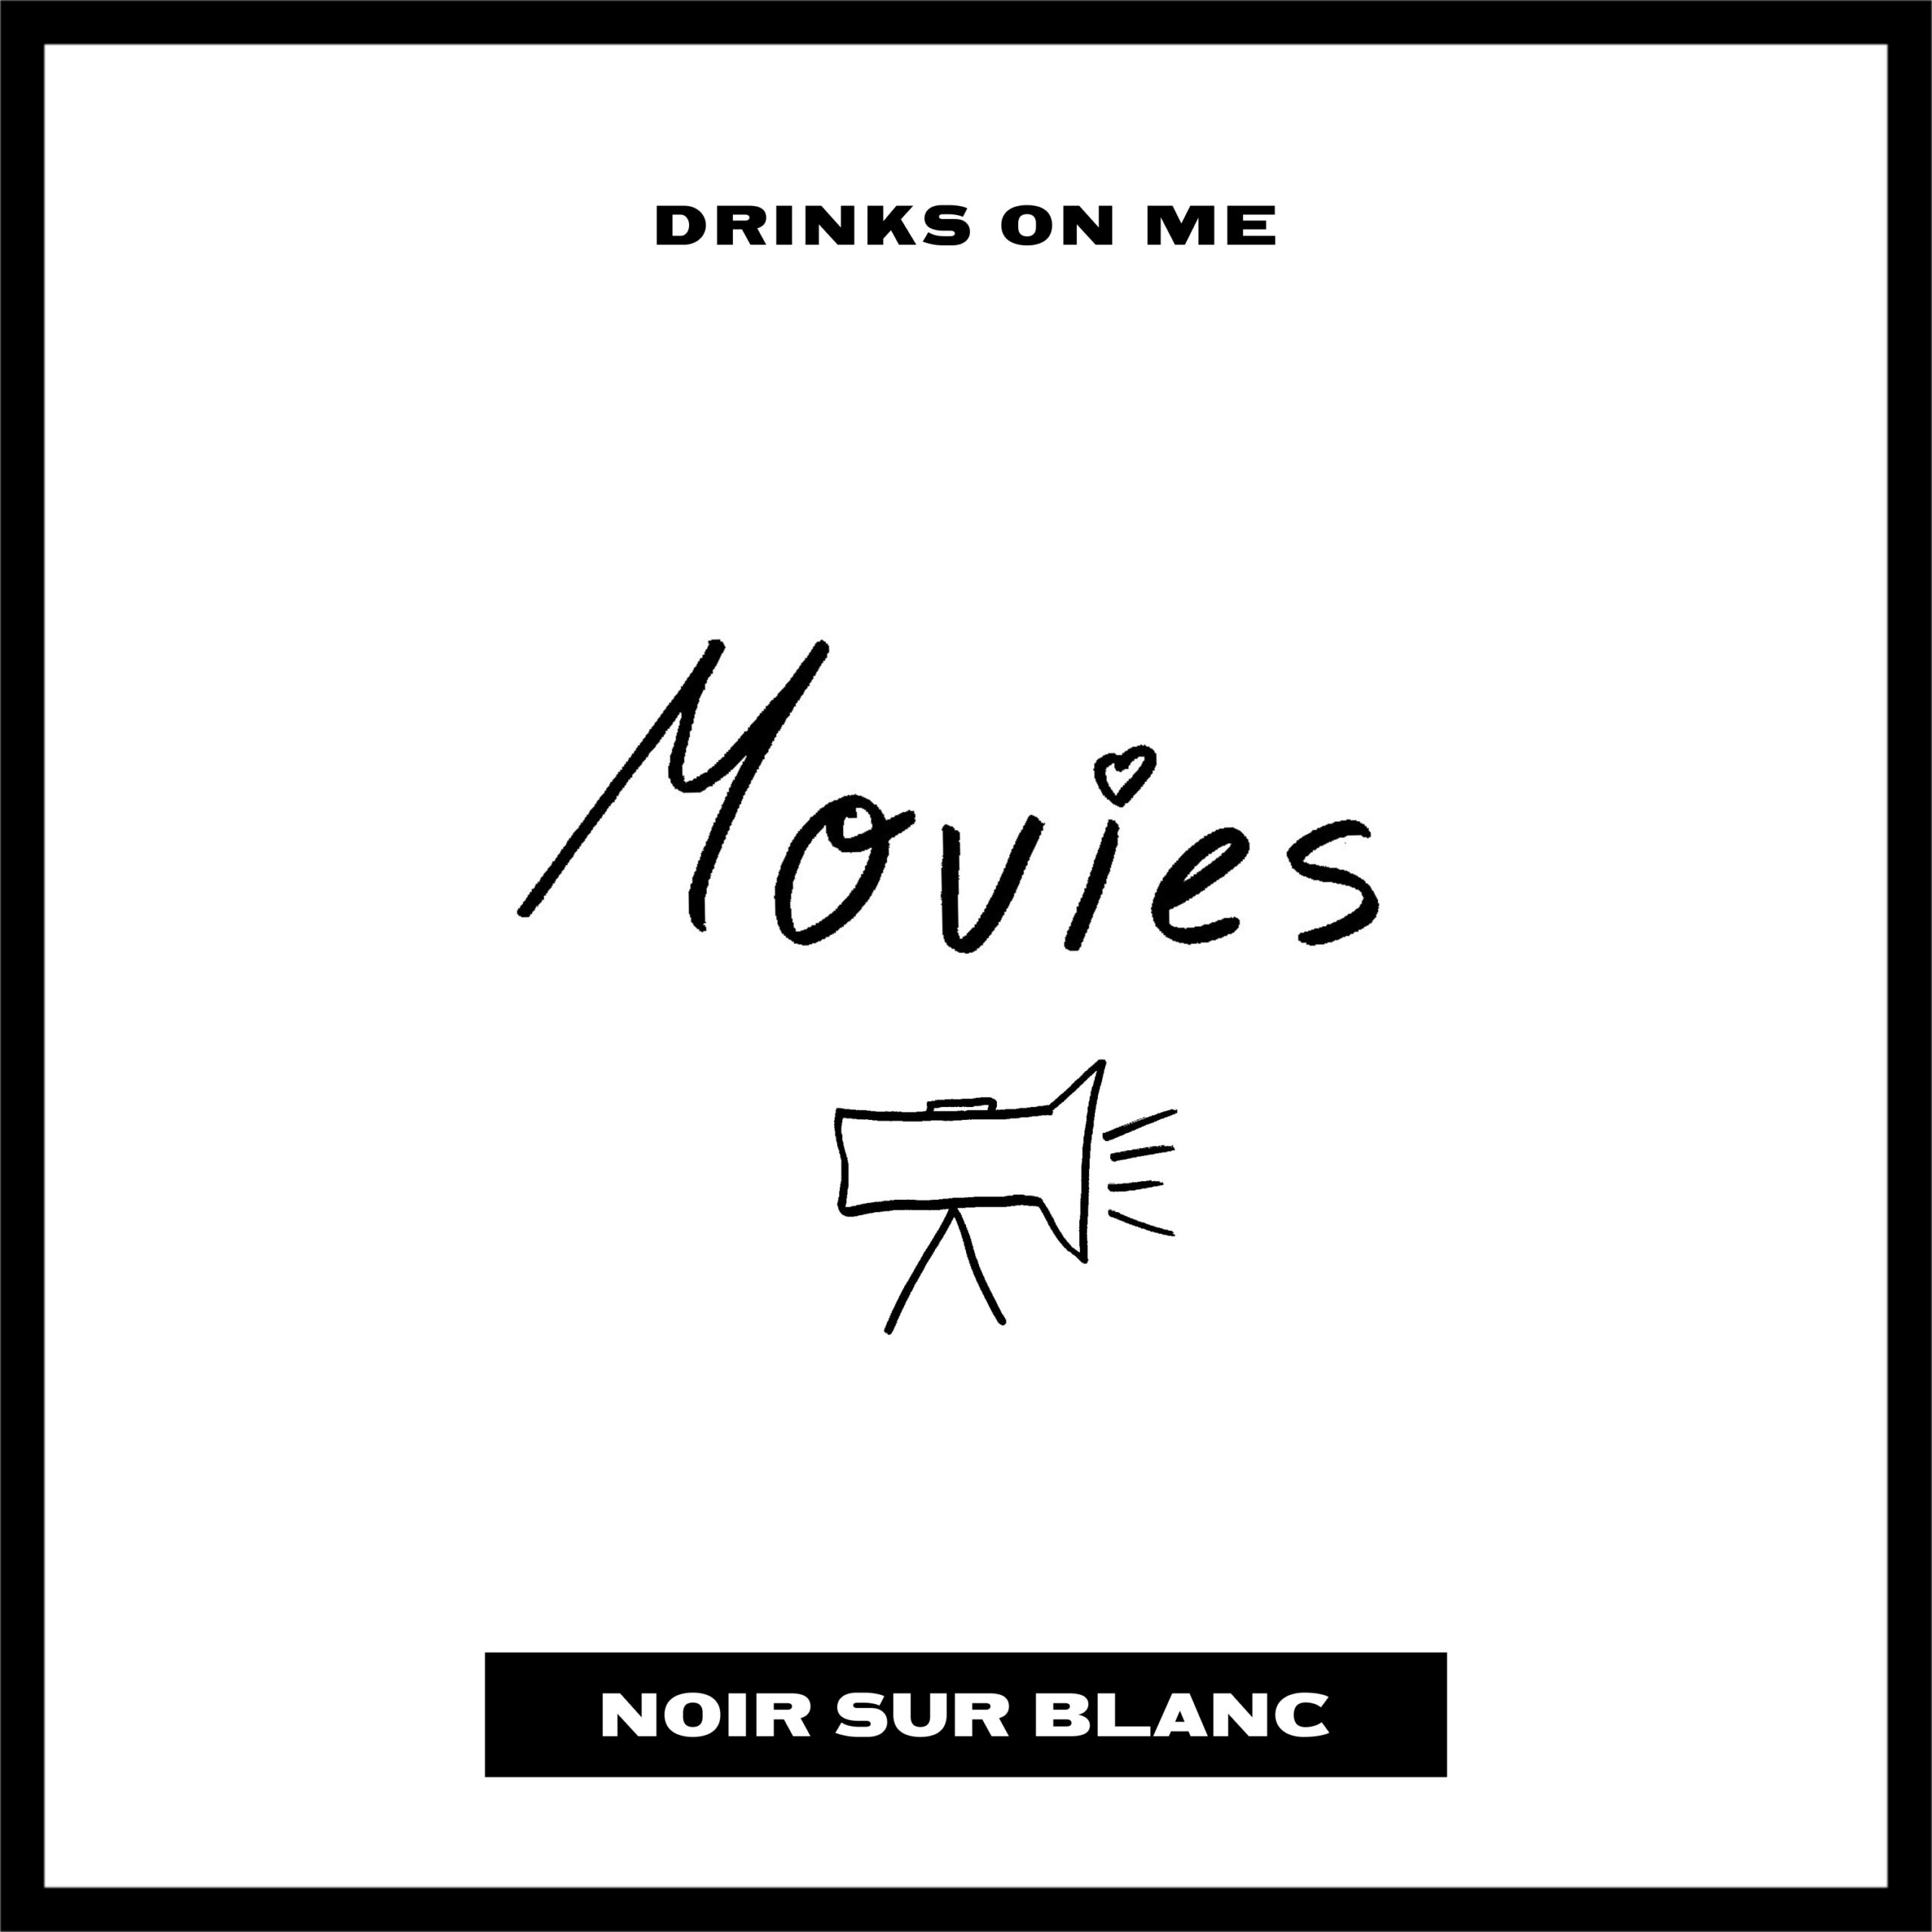 MOVIES DRINKS ON ME